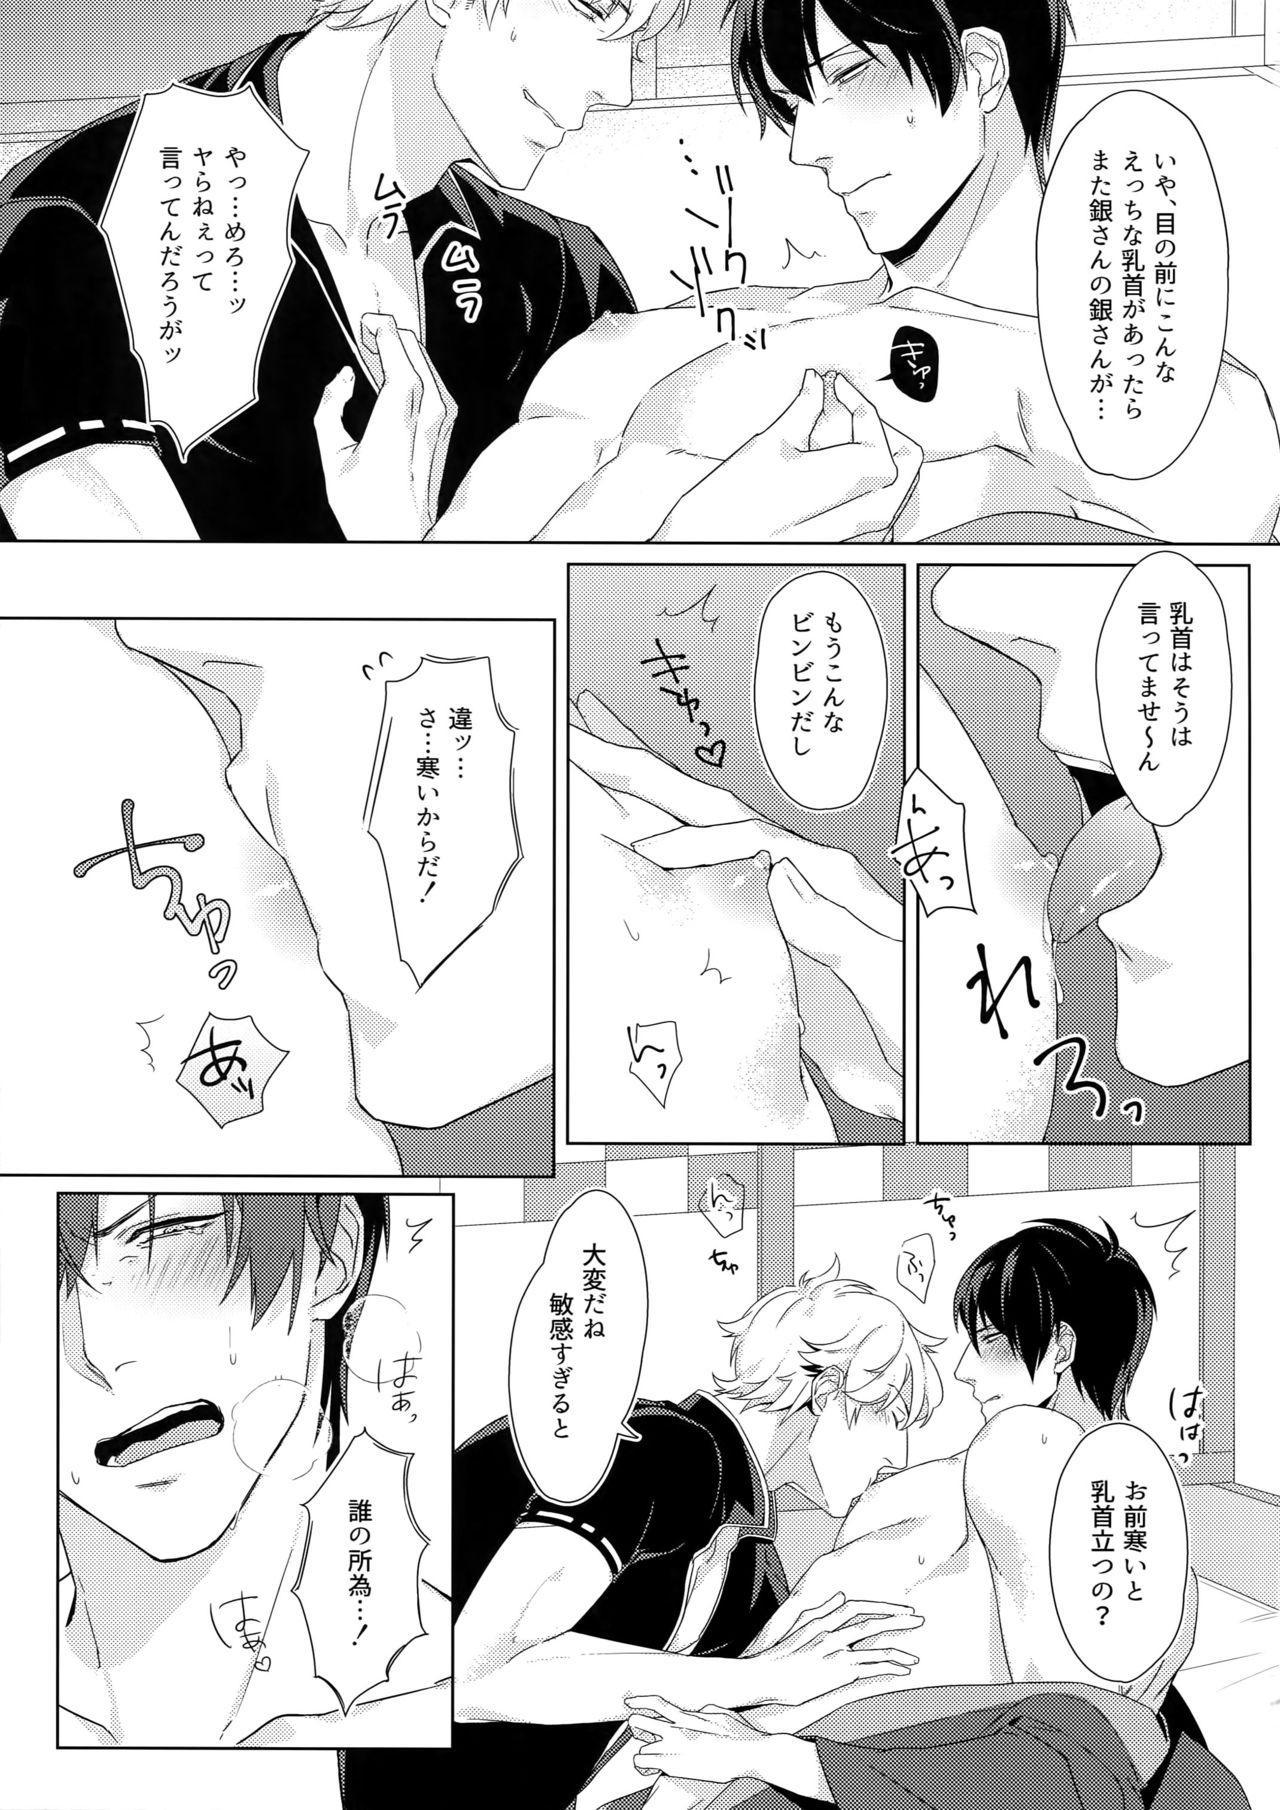 Perfume 9